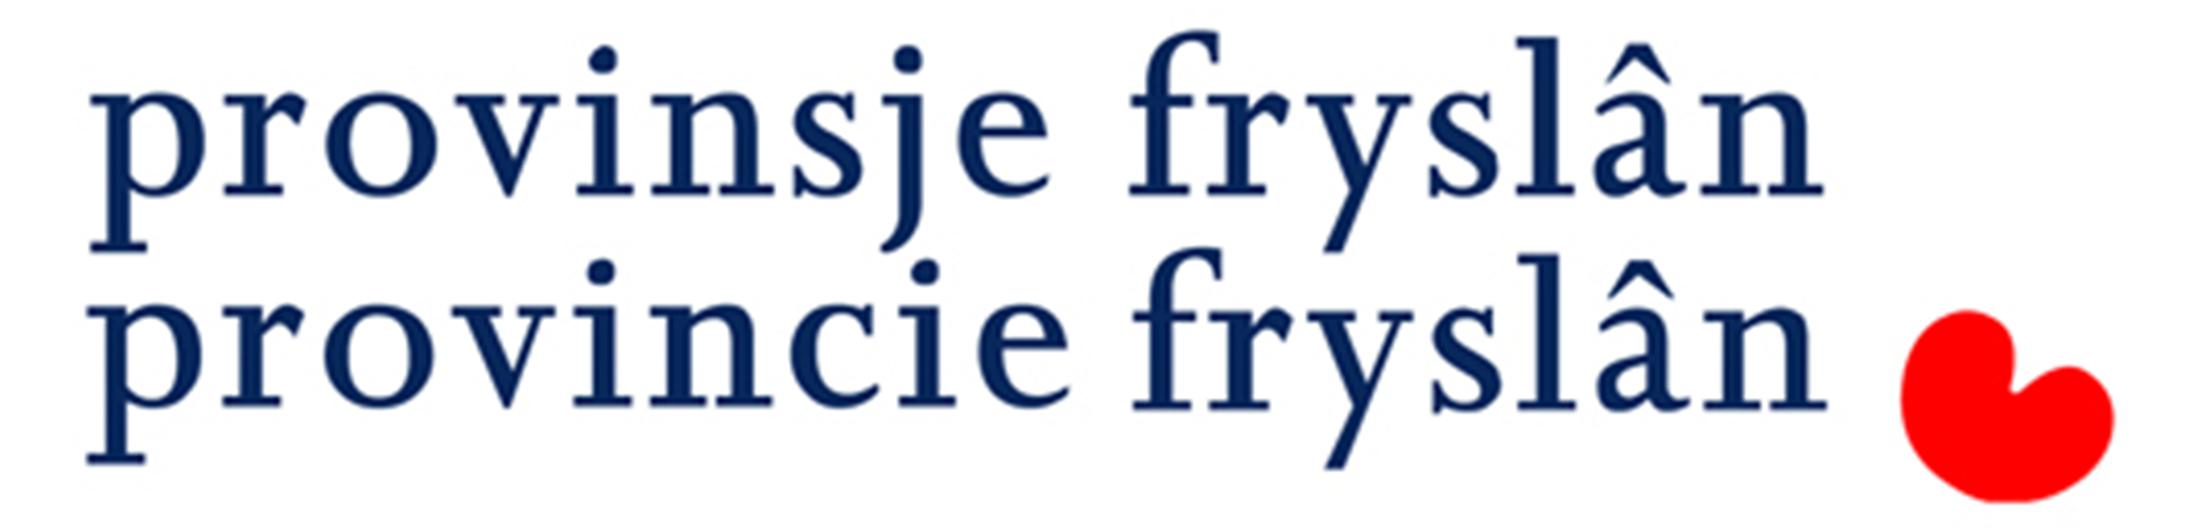 provincie_fryslan